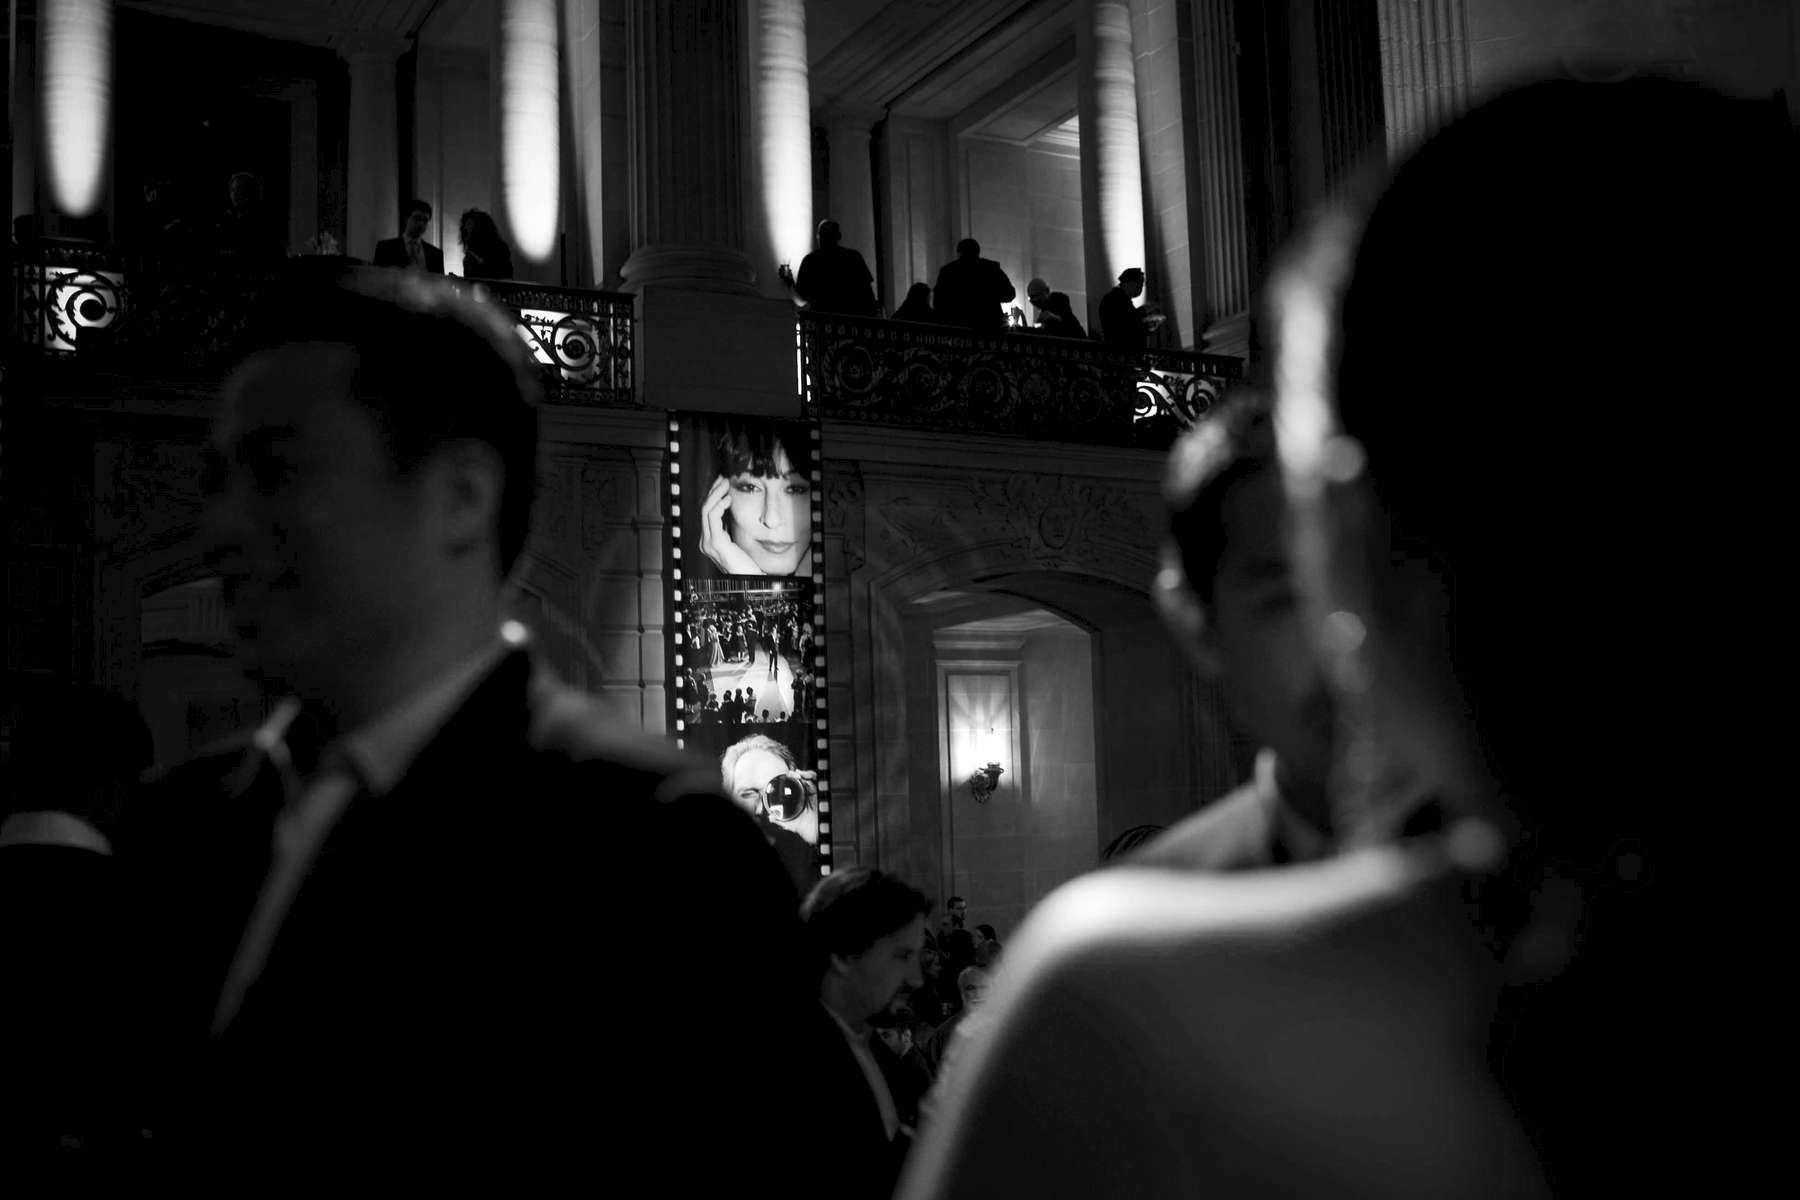 10_City-Hall-Opening-Night_02_2007bw-copy